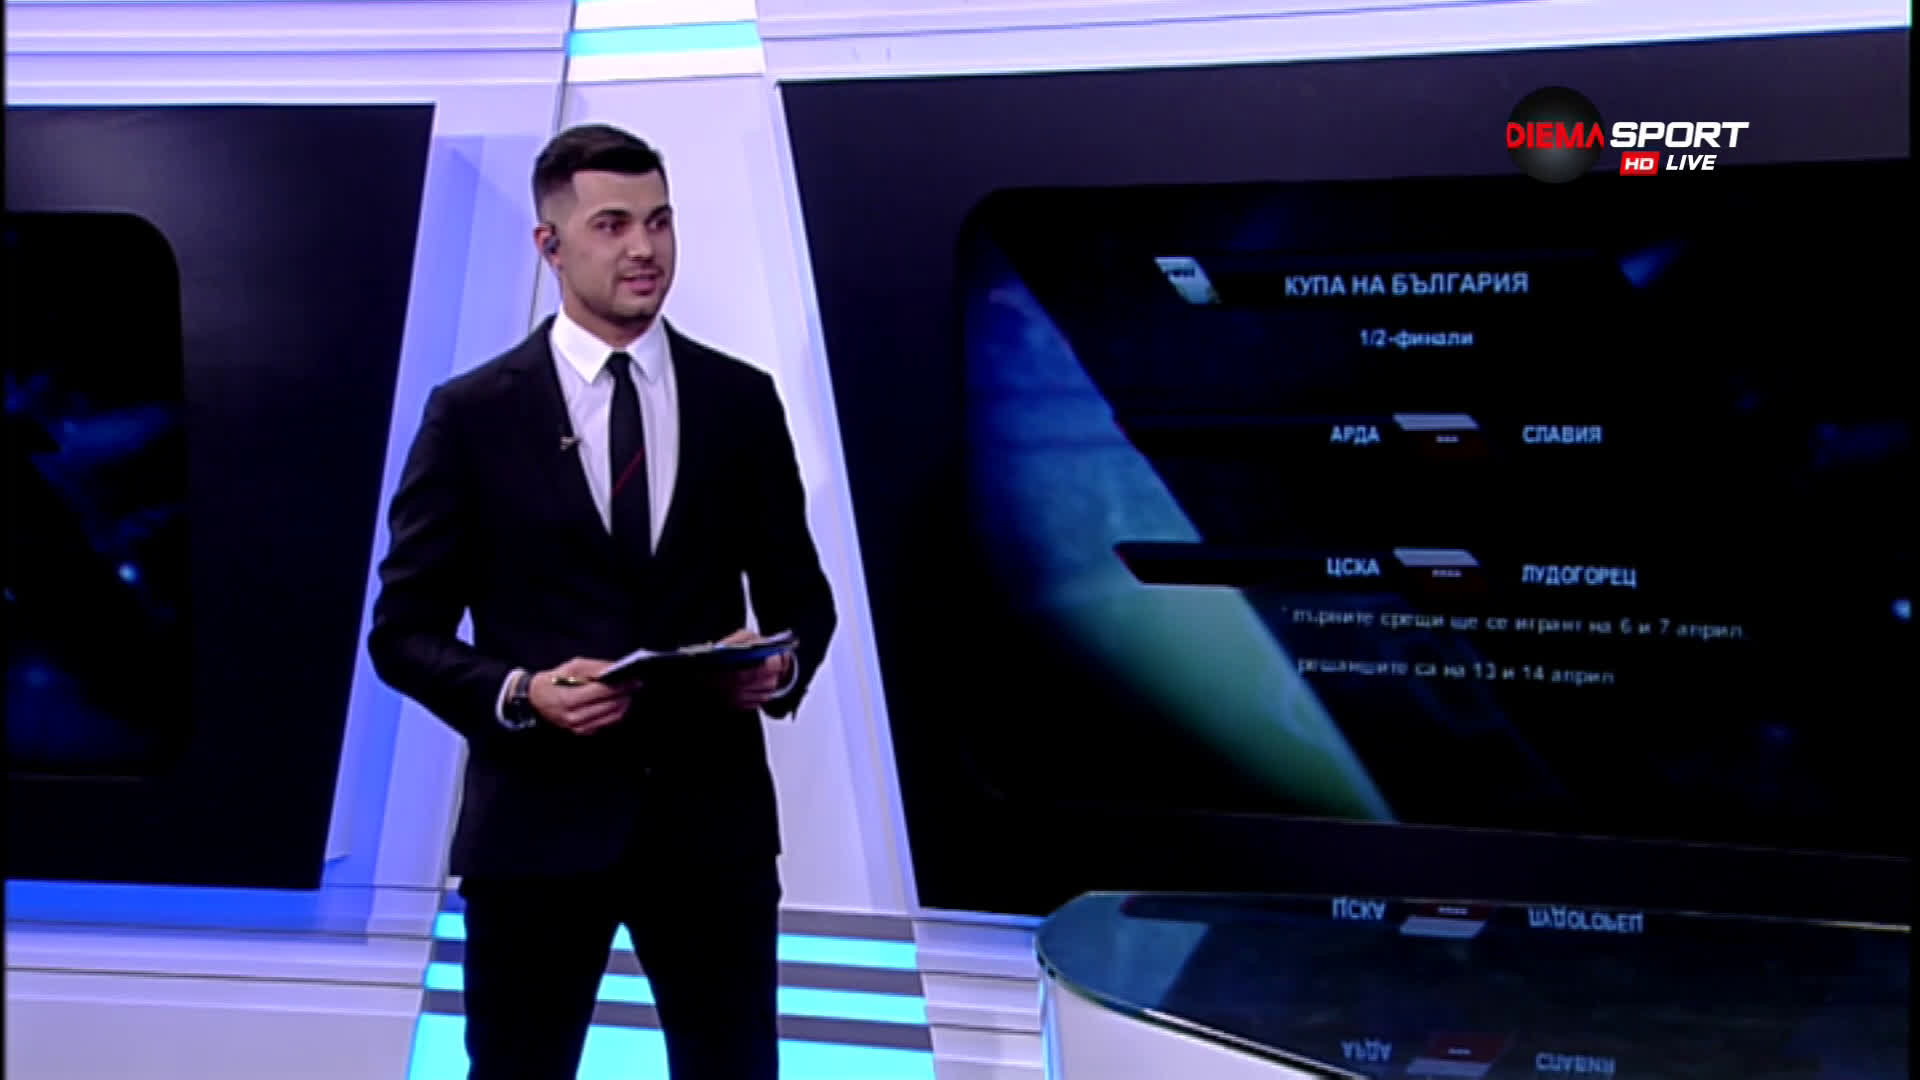 ЦСКА vs. Лудогорец на 1/2-финалите за Купата!